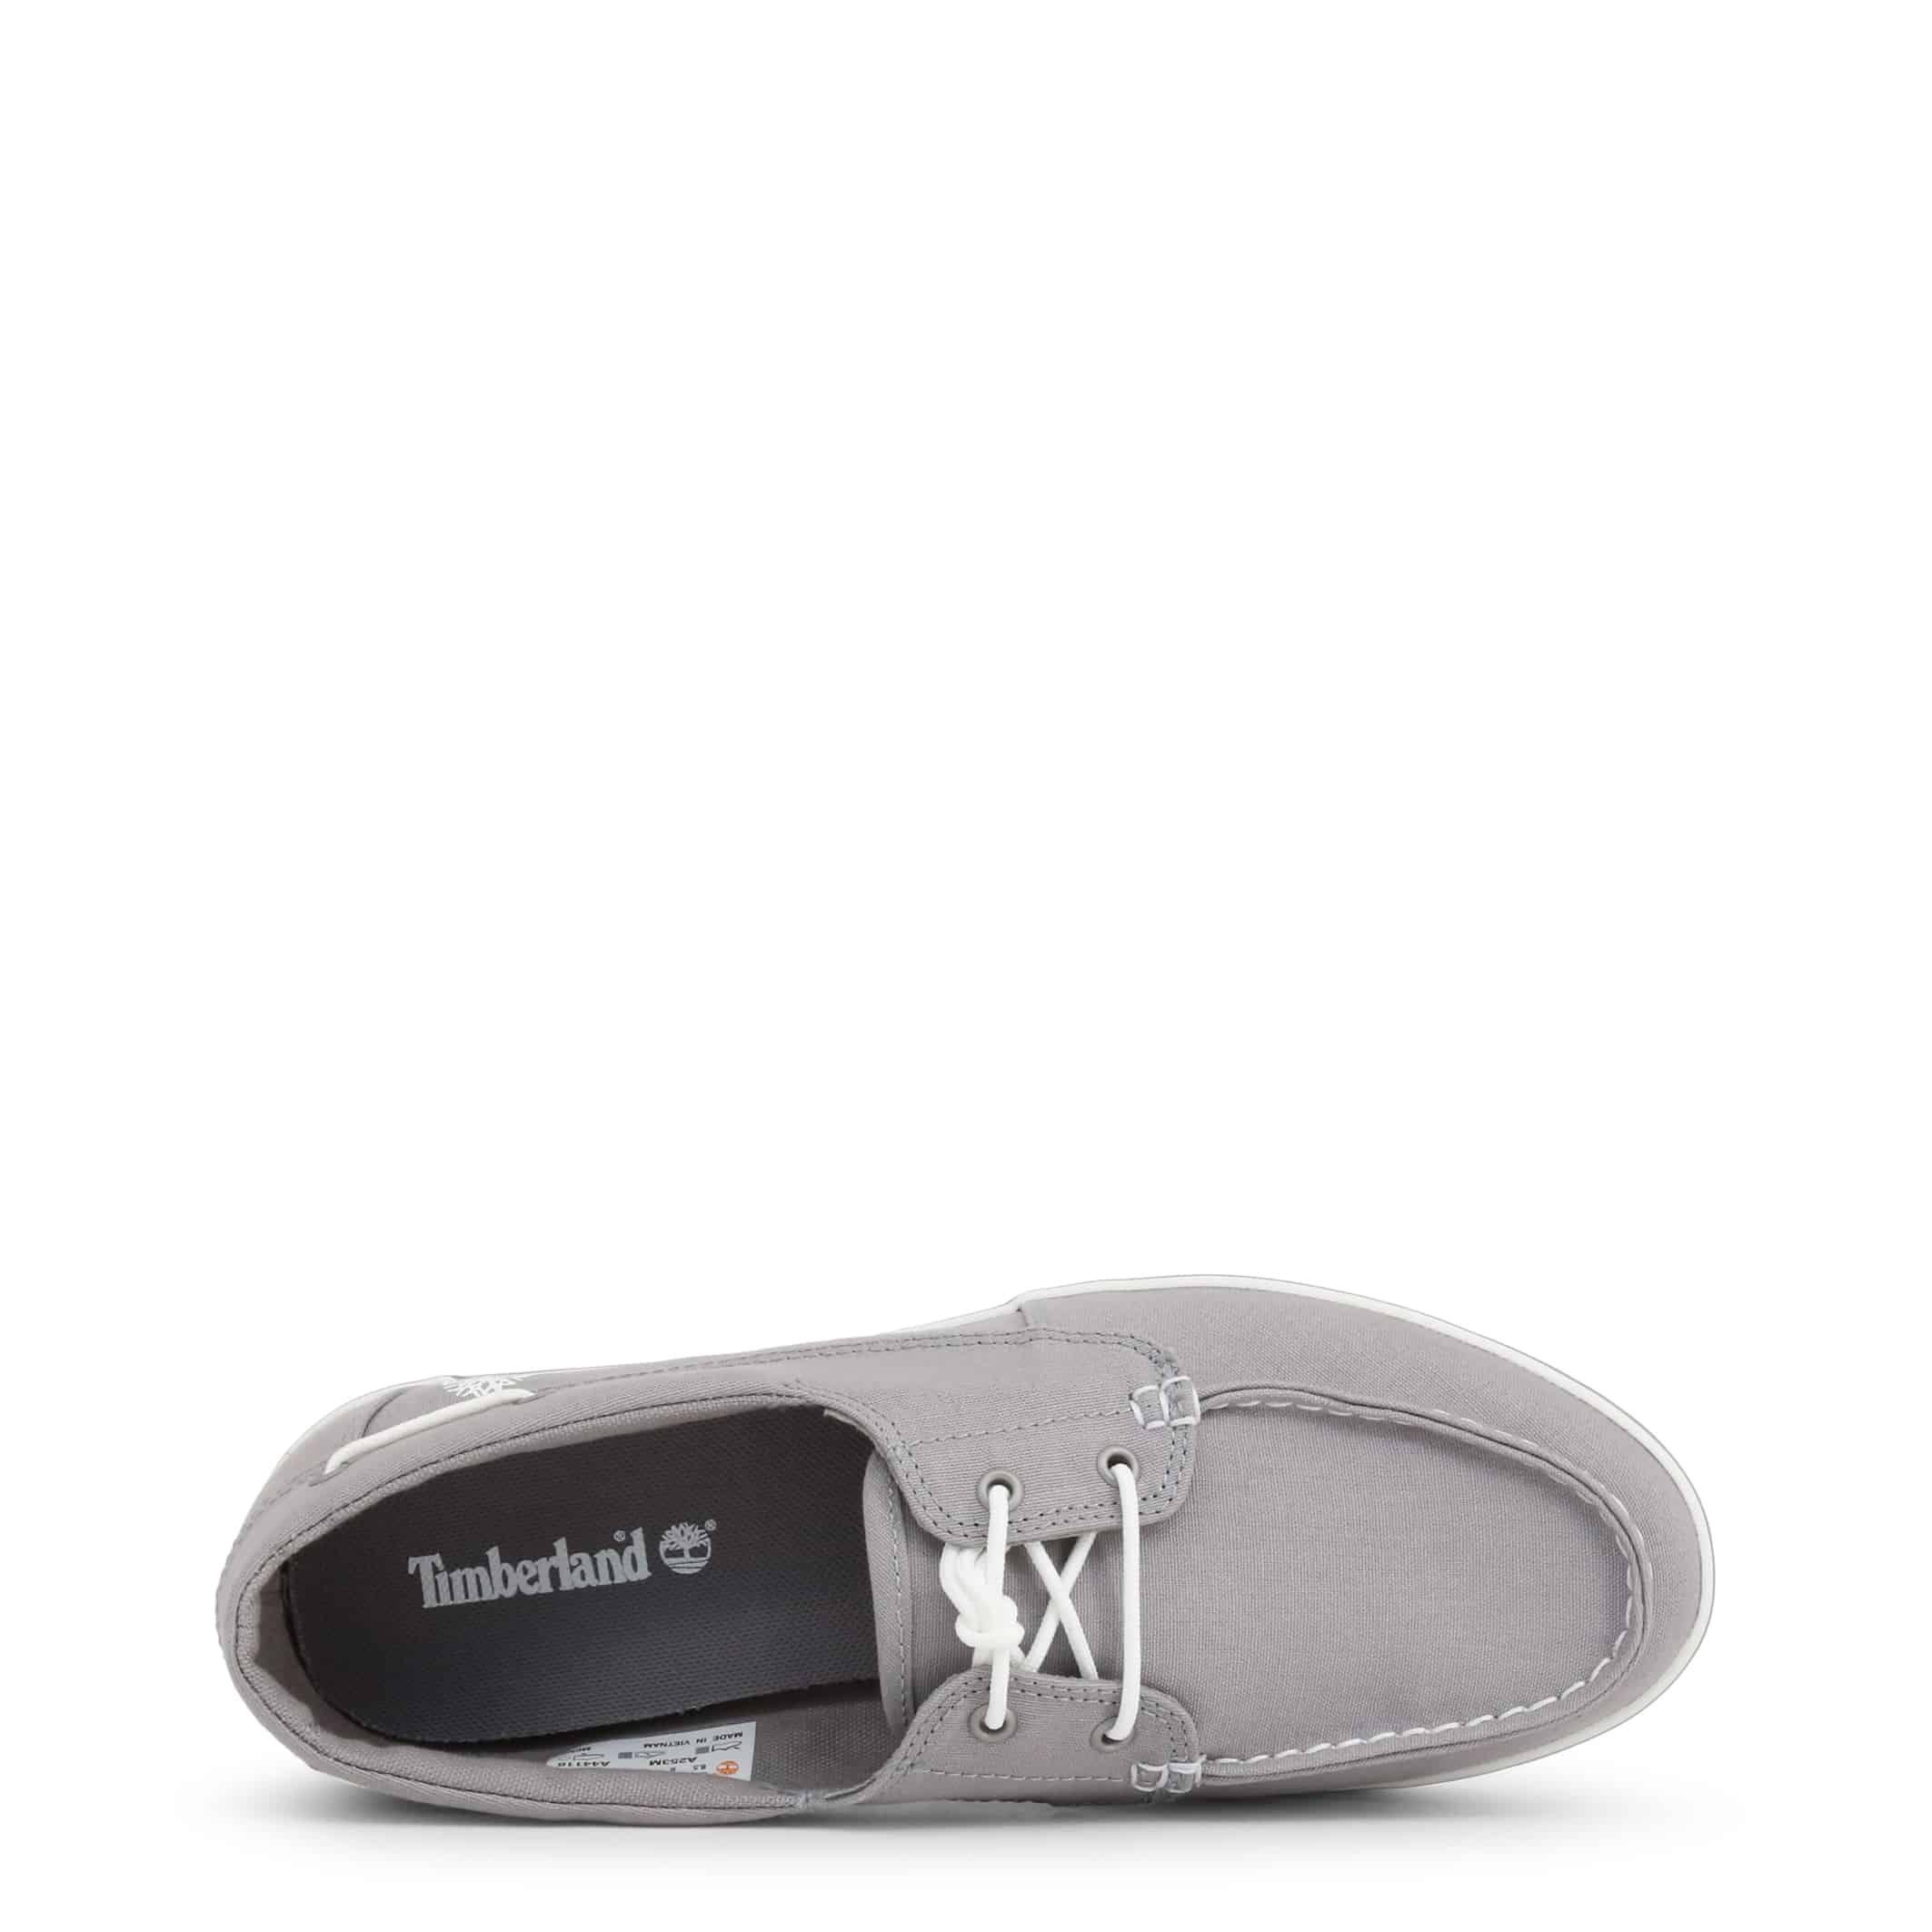 Mokassins Timberland – SkapeParkBoat – Grau